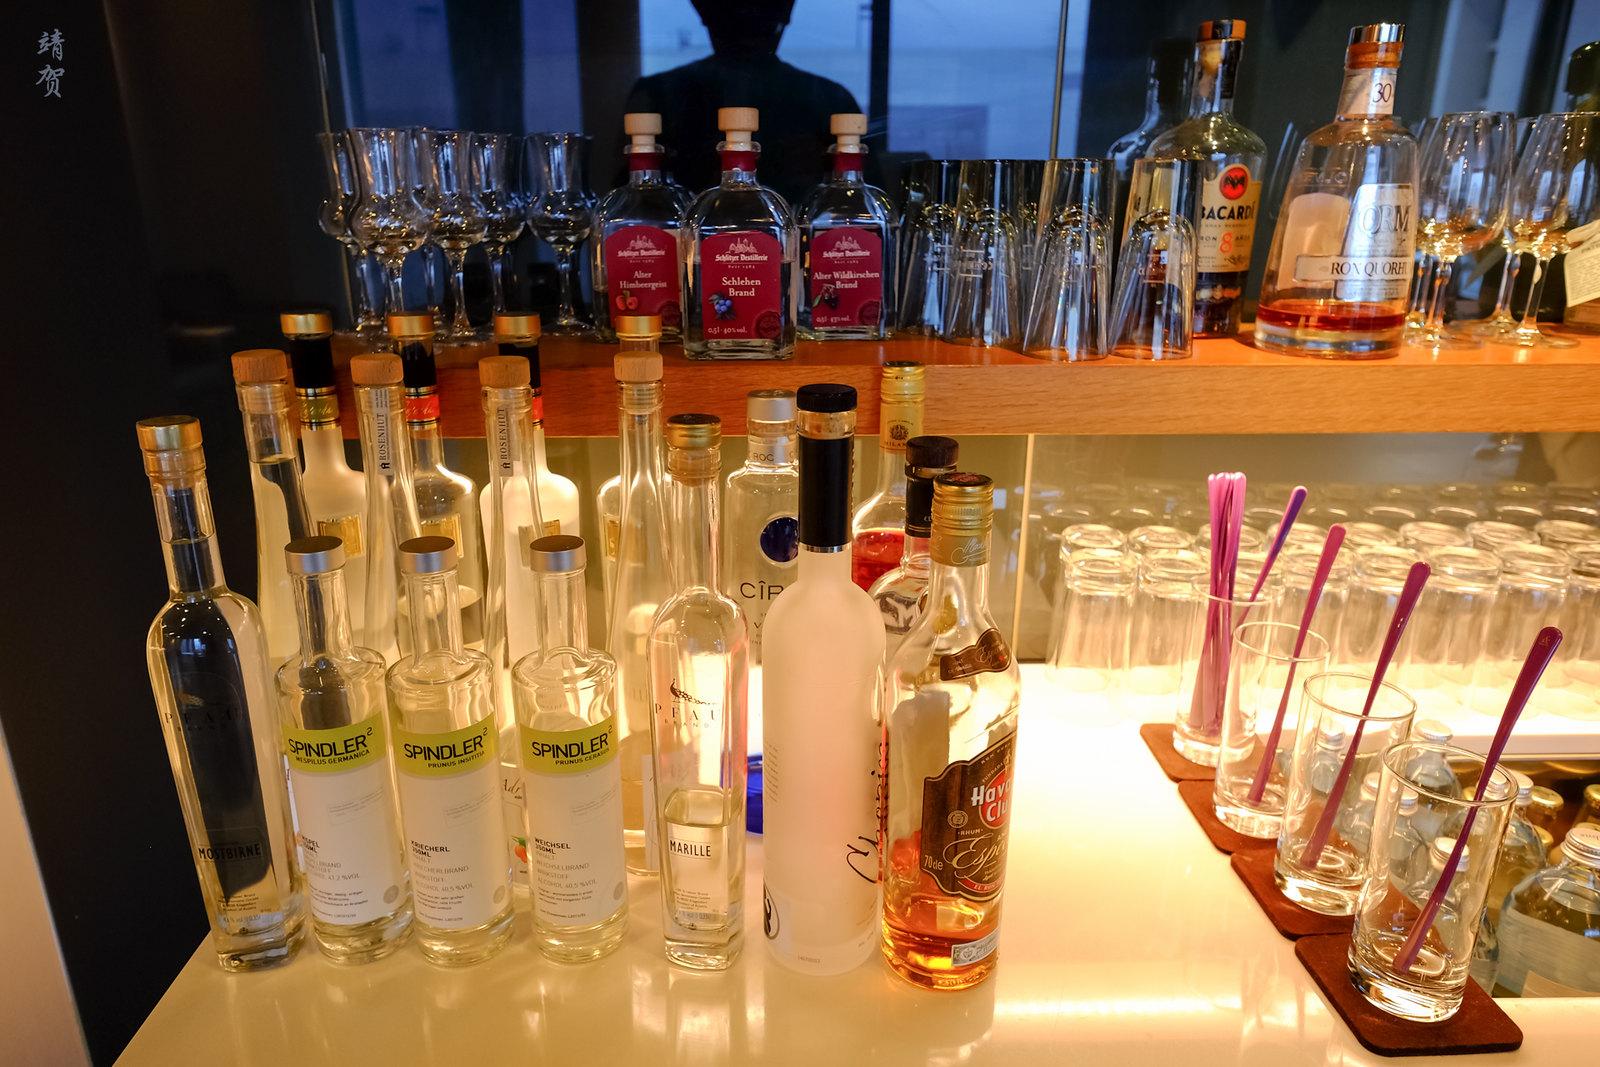 Liquor in the Cigar lounge